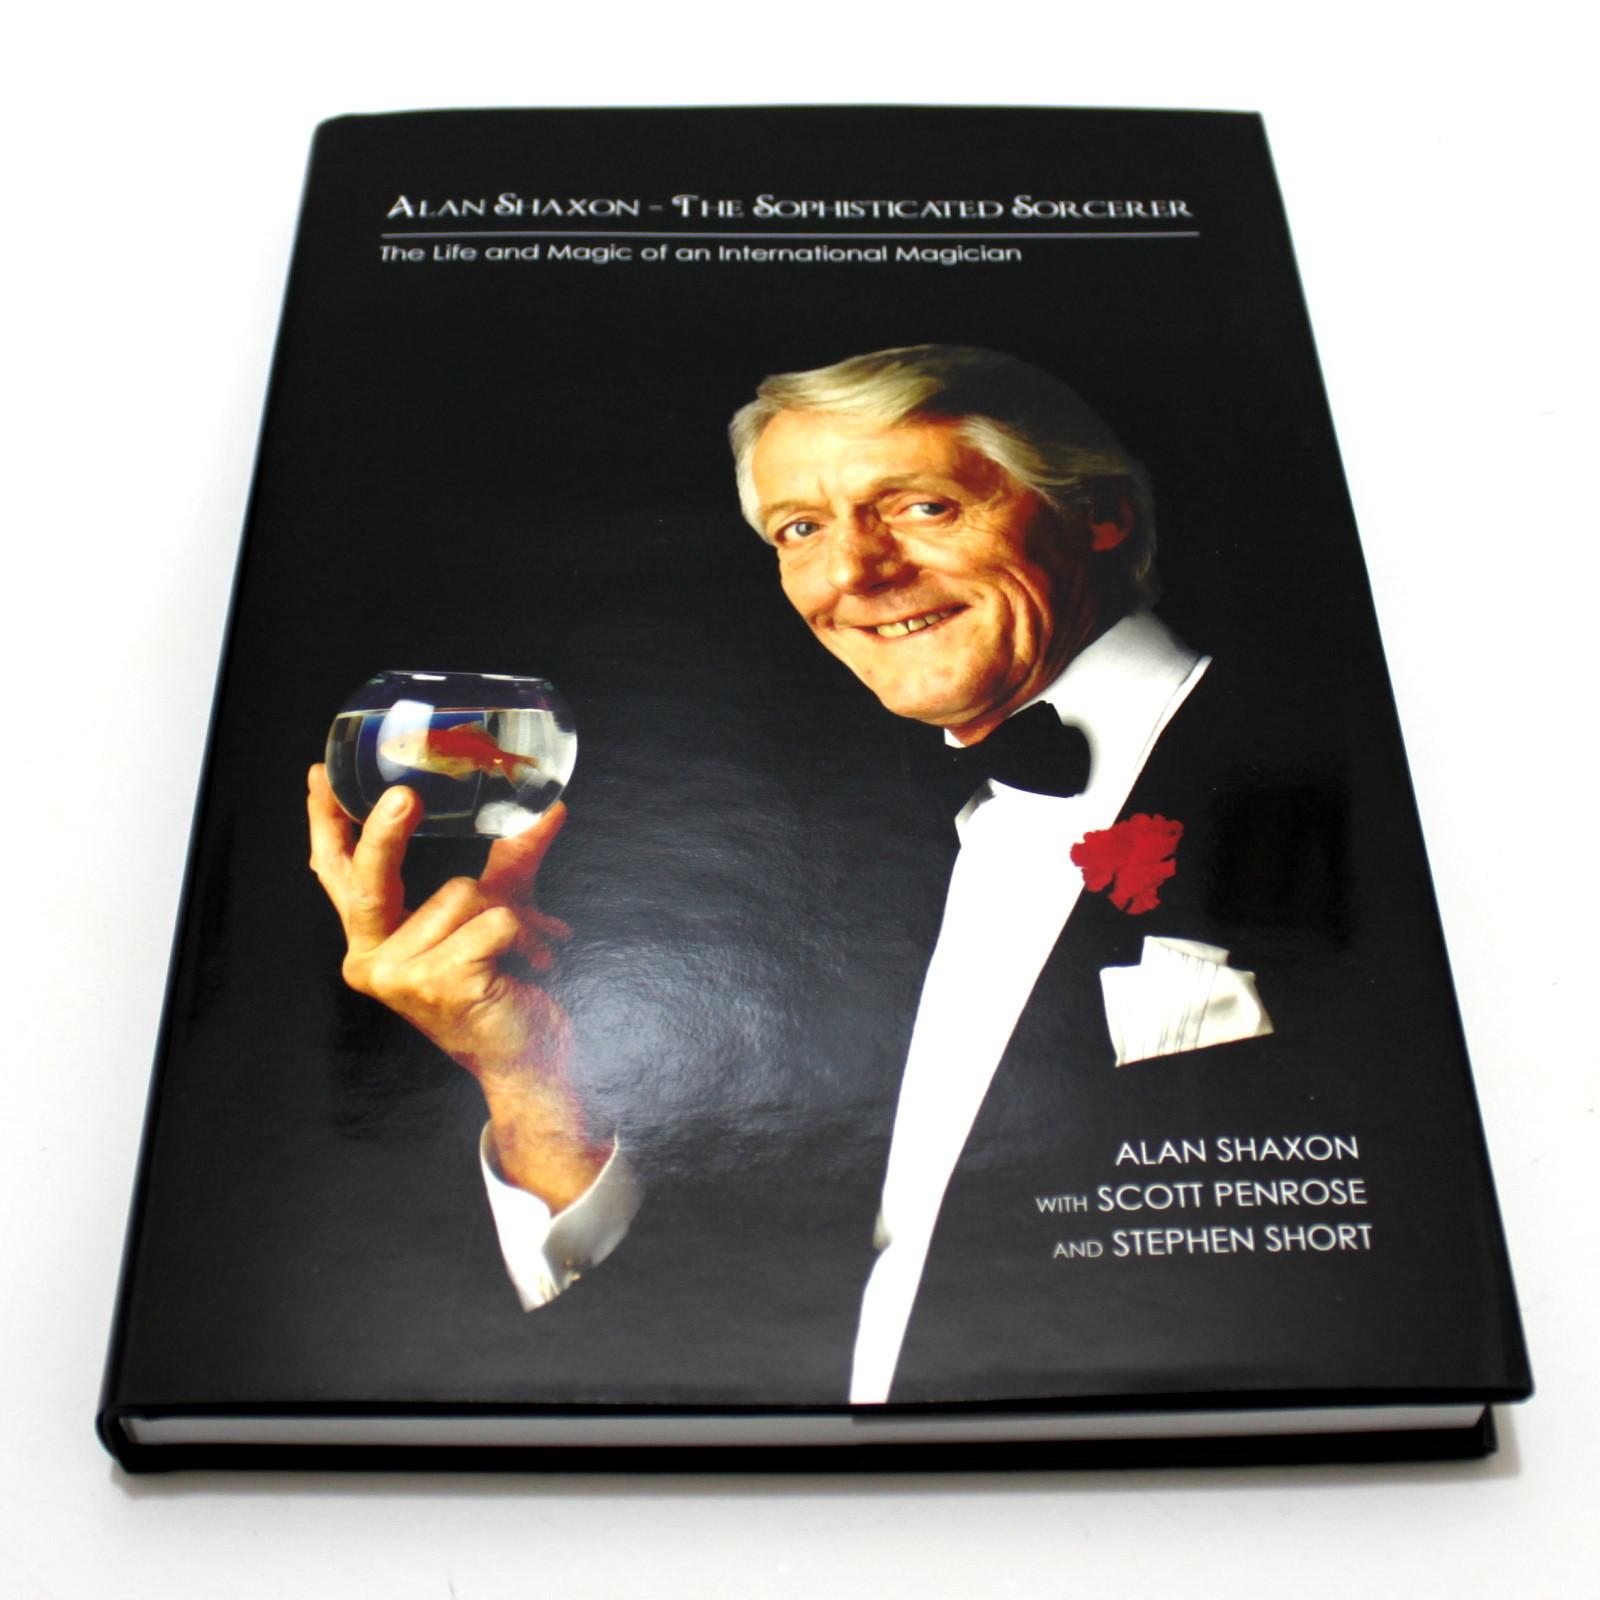 Alan Shaxon - The Sophisticated Sorcerer by Alan Shaxon, Scott Penrose, Stephen Short